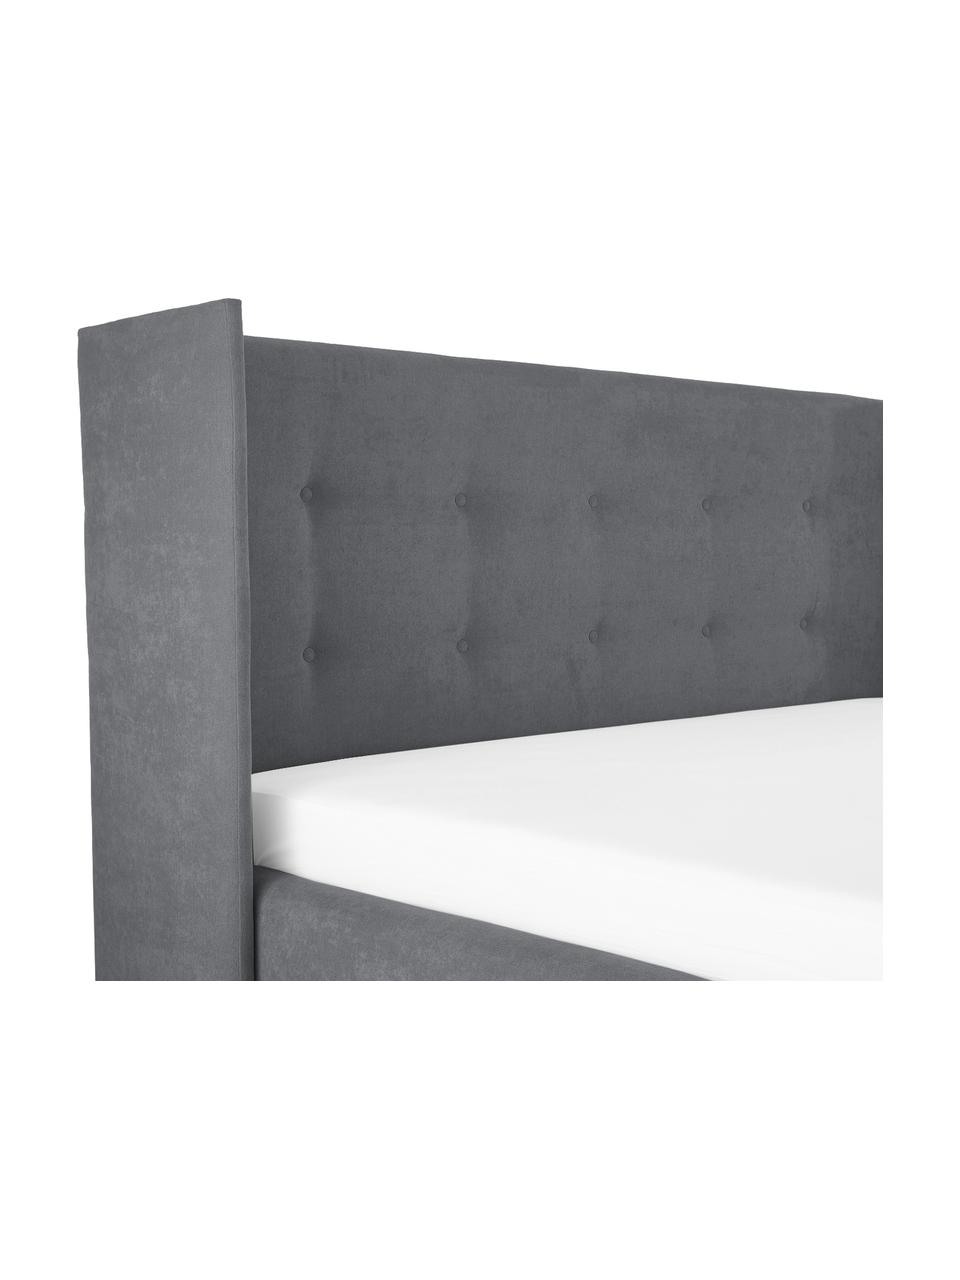 Gestoffeerd bed Star, Frame: massief grenenhout, Bekleding: polyester (structuurmater, Donkergrijs, 180 x 200 cm